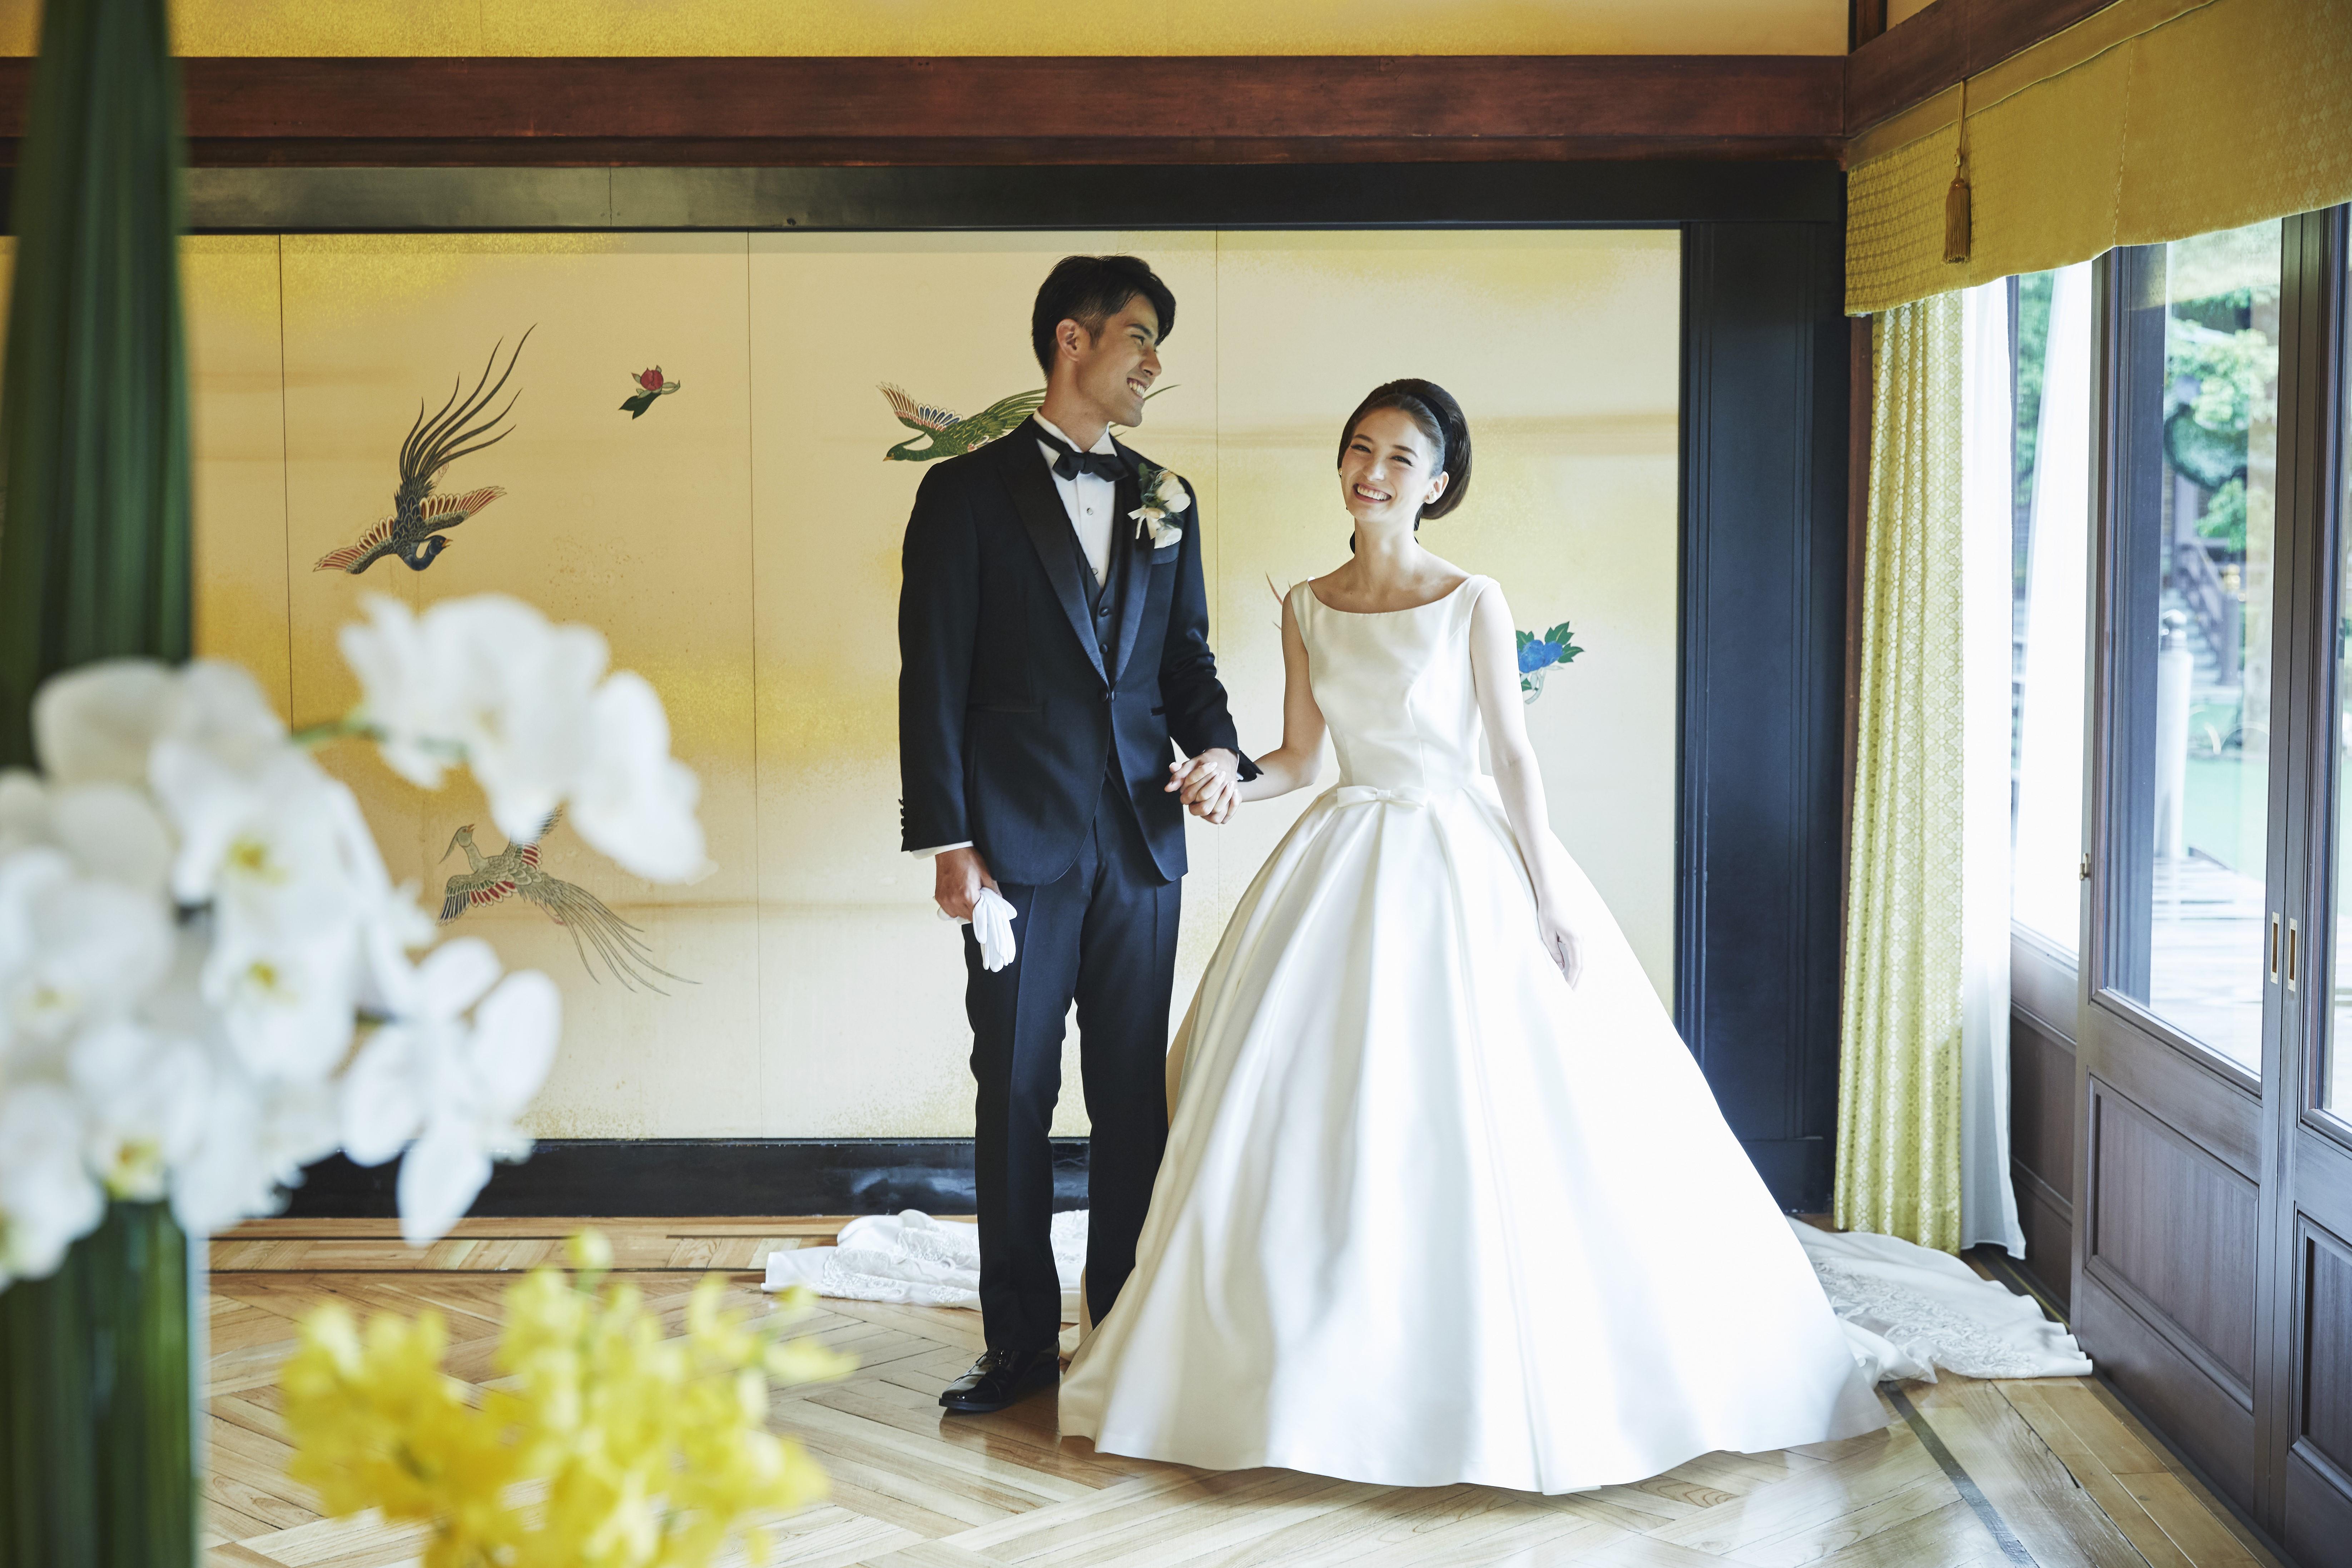 0a7e411c5d0e8 明治神宮・明治記念館で神前式の結婚式・披露宴|日本の結婚式